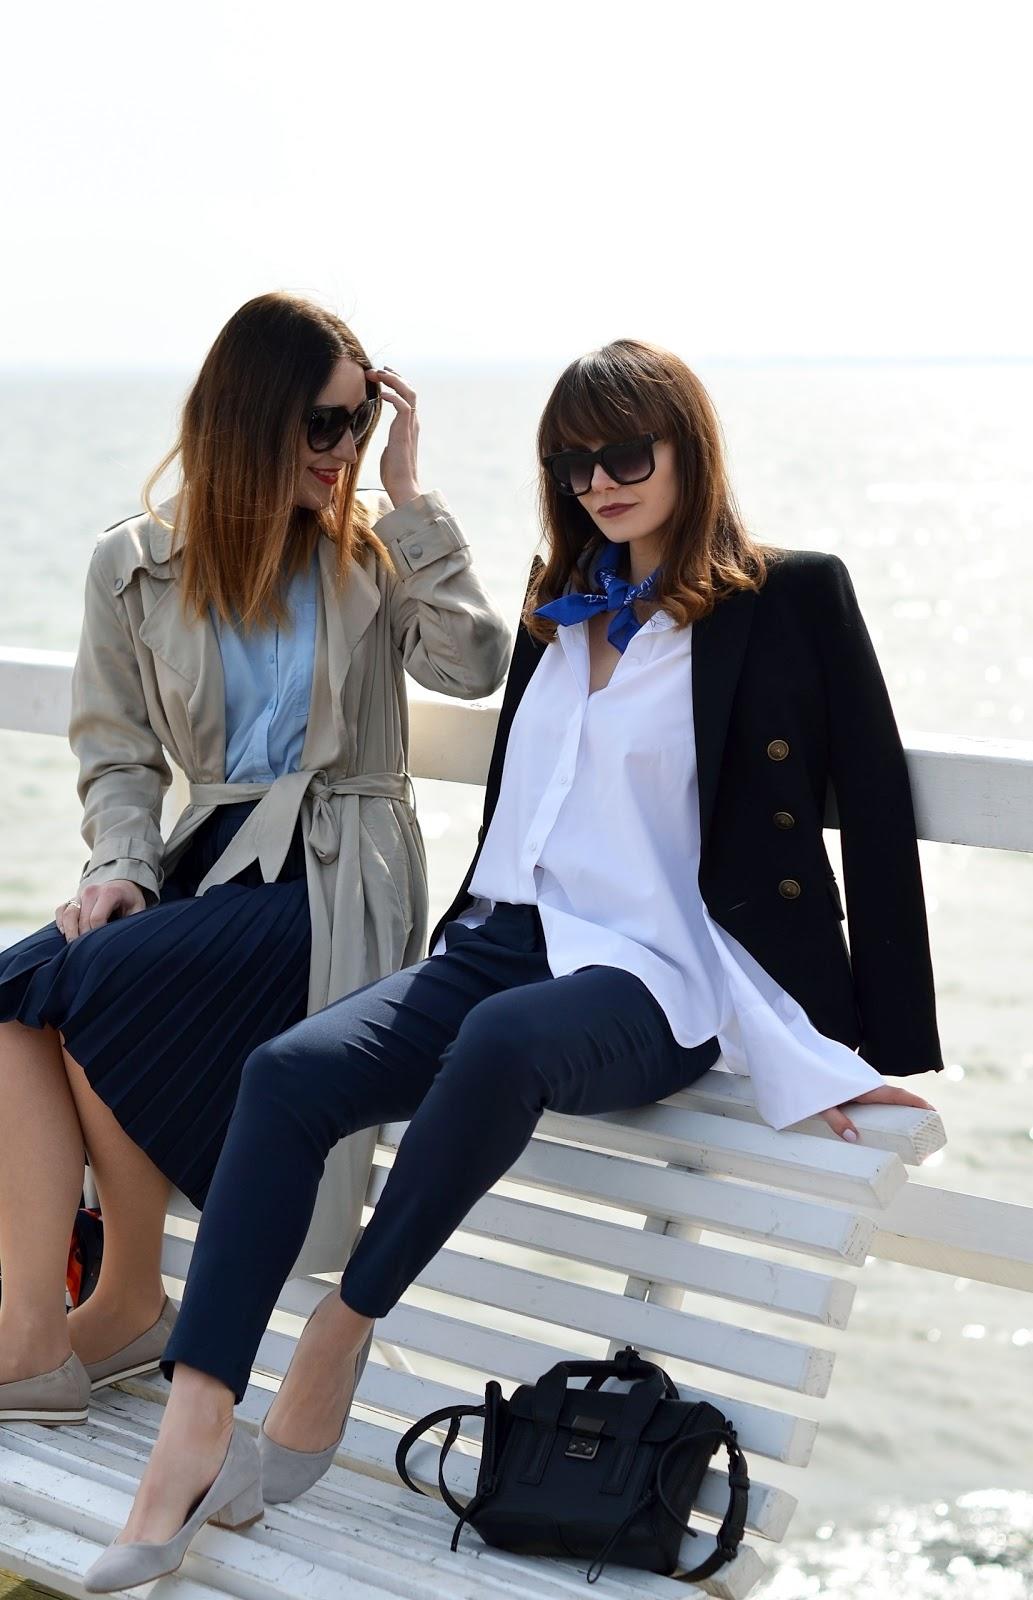 blogerki modowe | blogerki w duecie